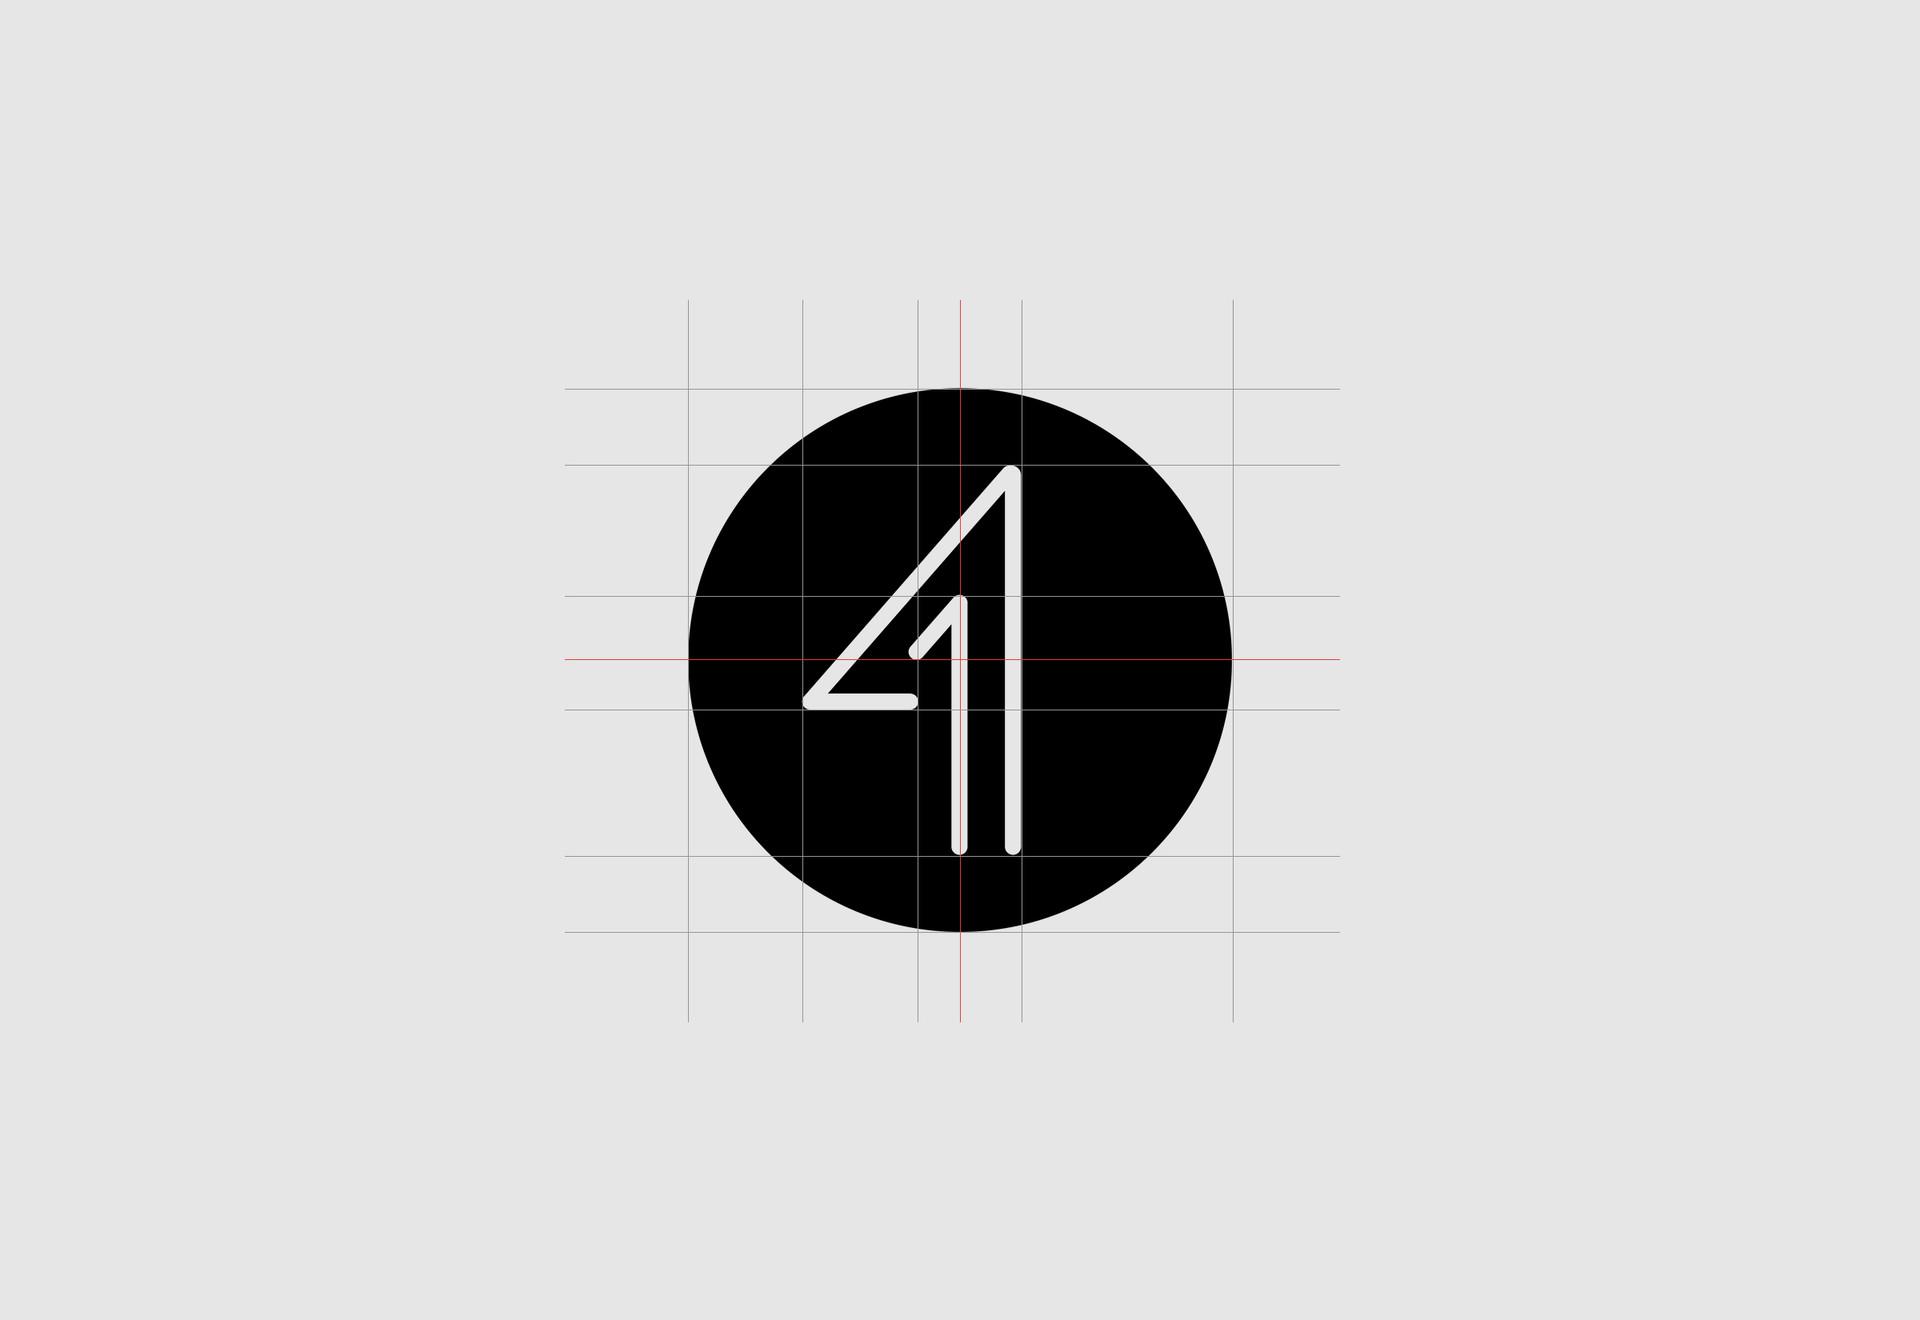 AreiaDesign-41Jun-3.jpg